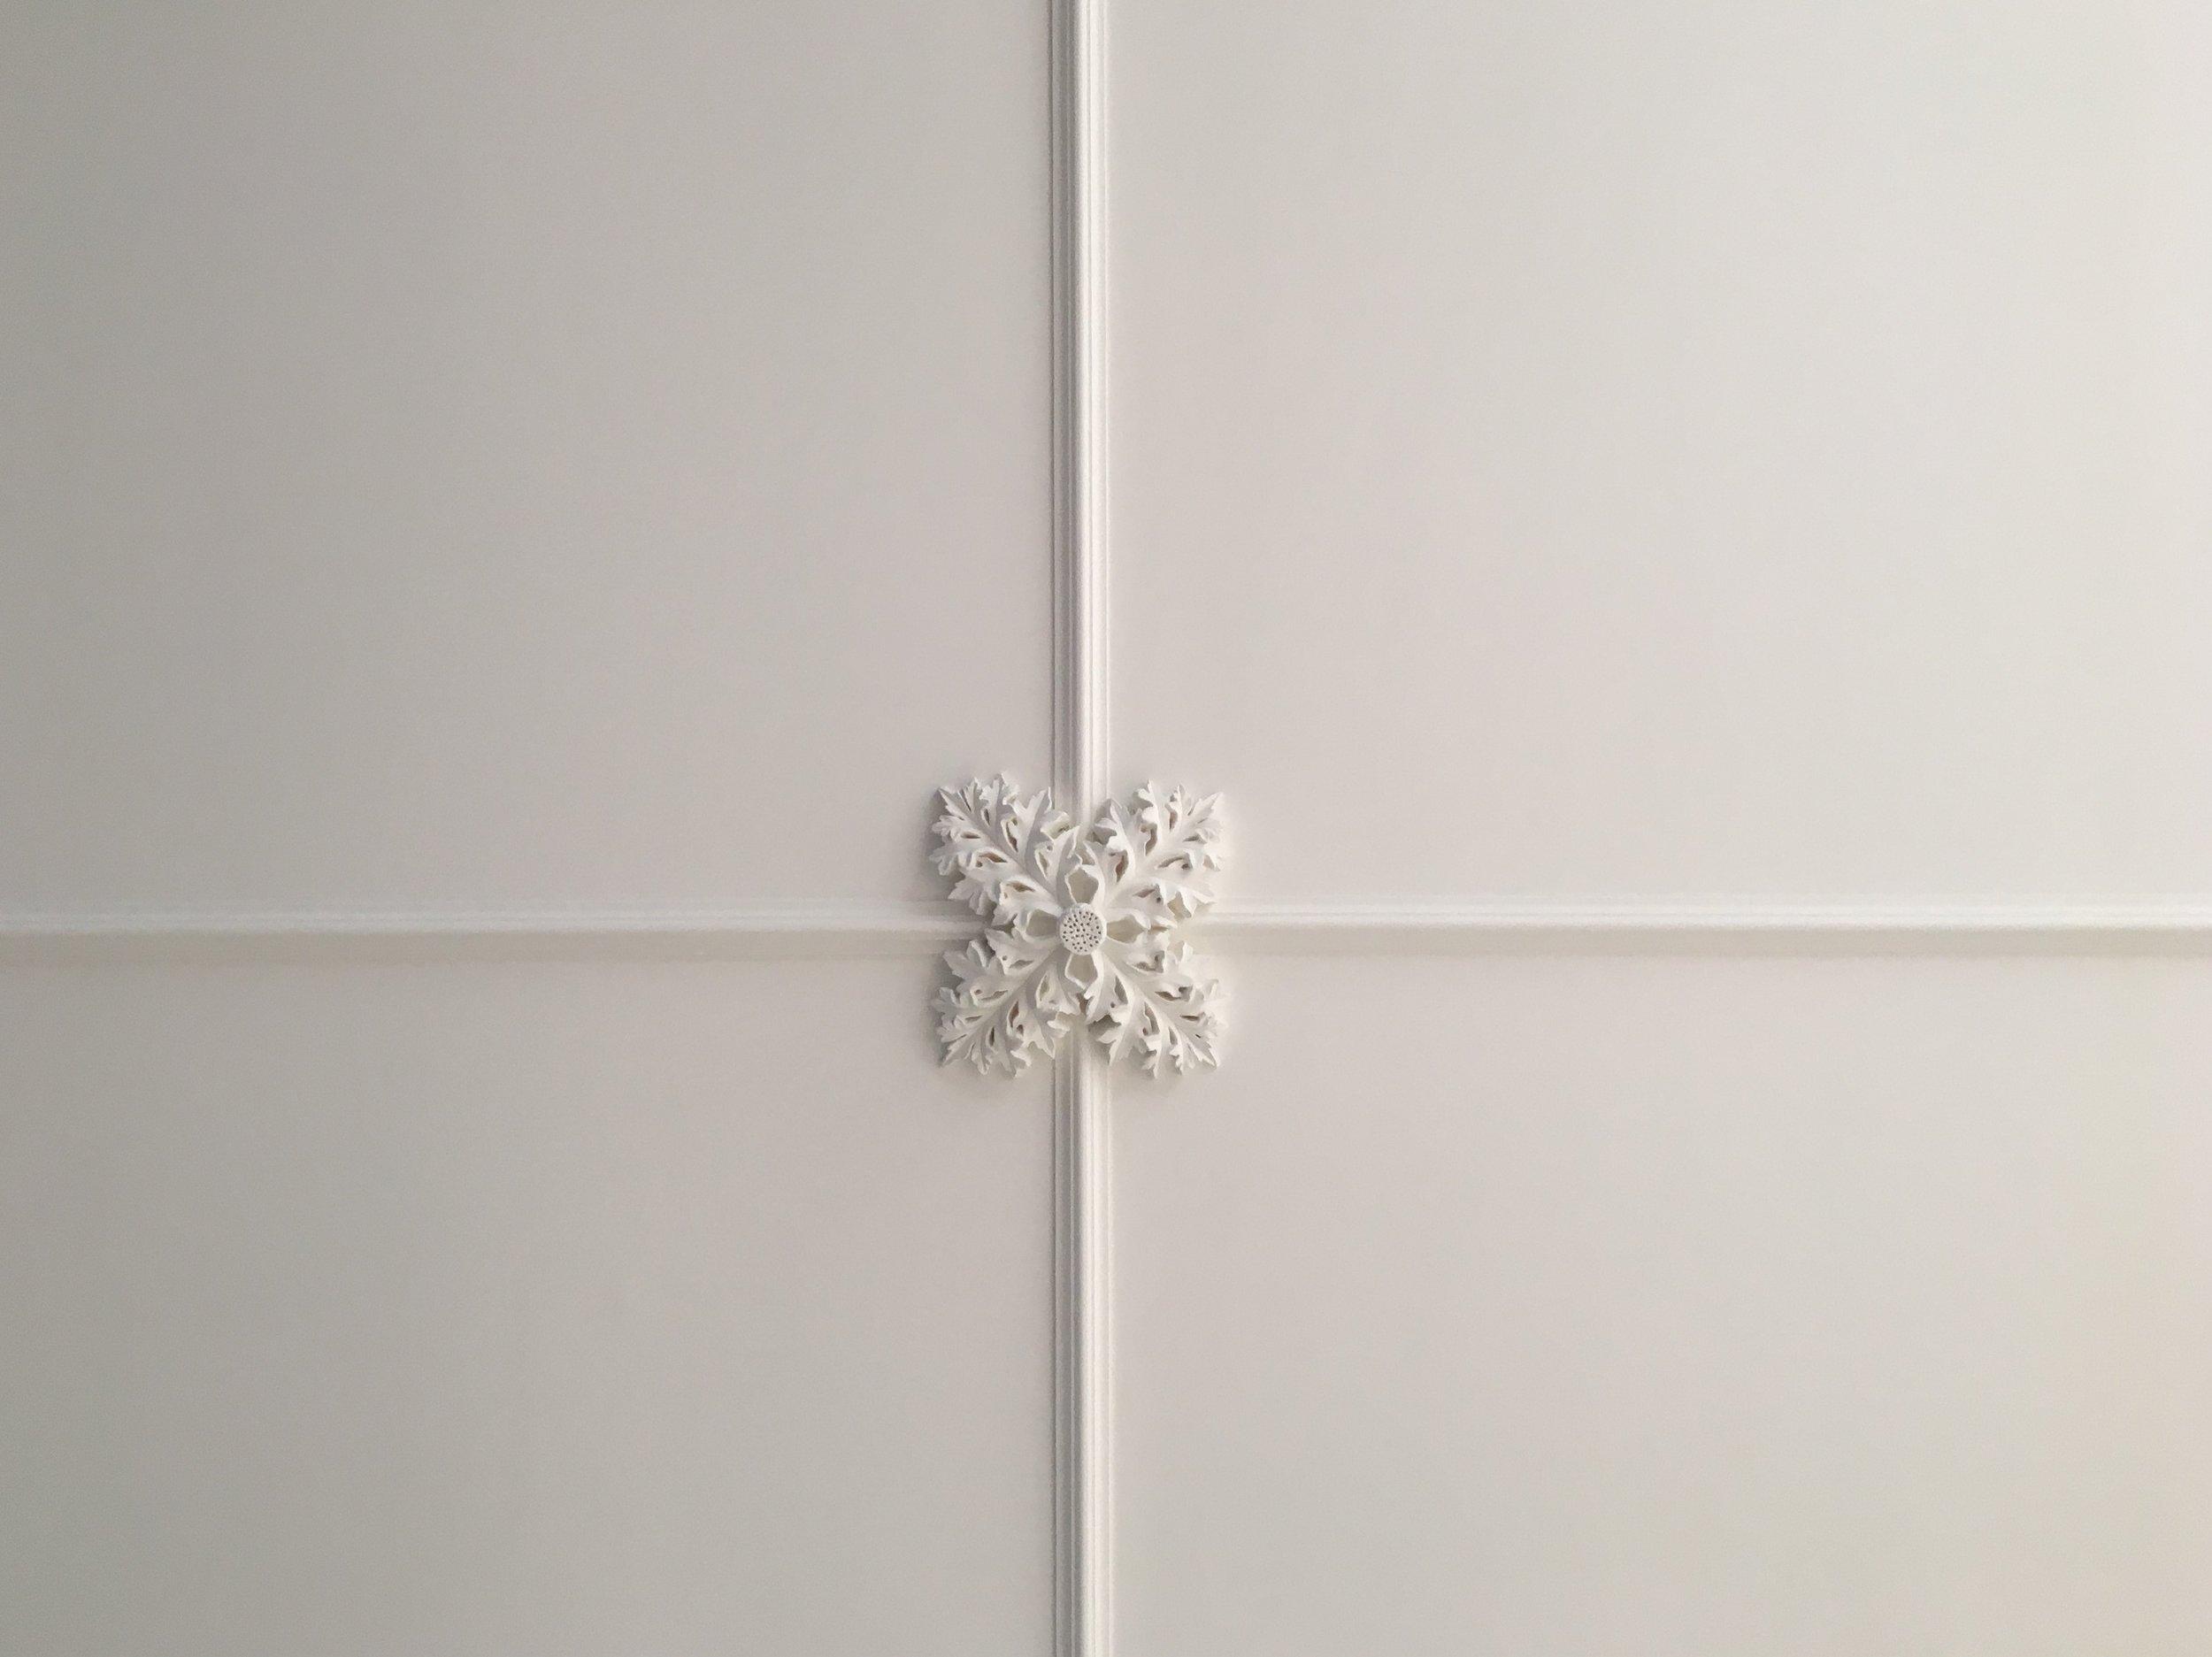 Bespoke relief detail for plaster ceiling designed by Cliveden Conservation.